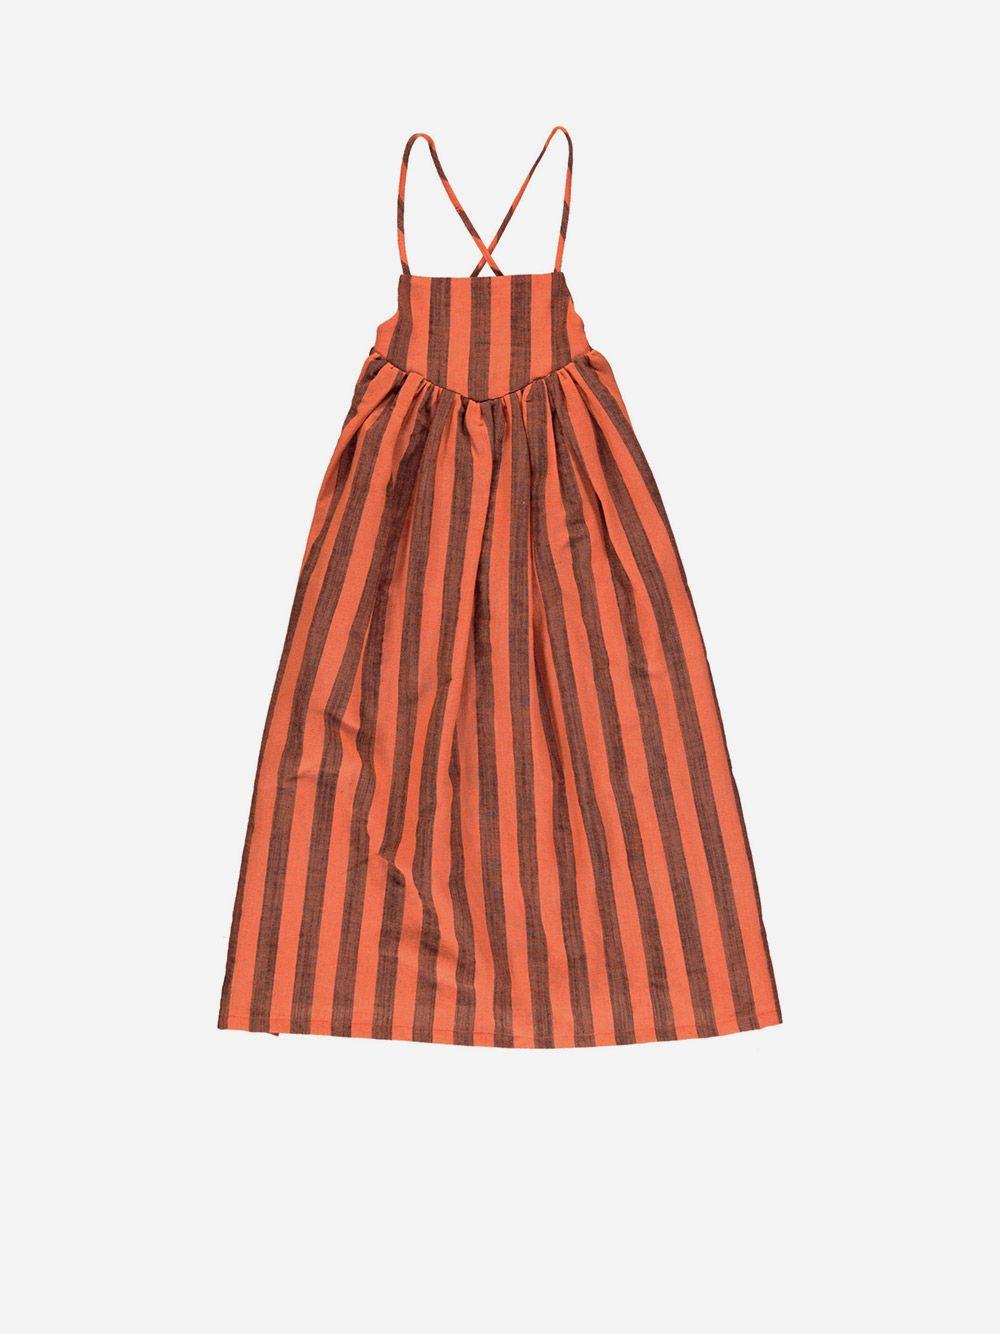 Long Dress Orange with Stripes